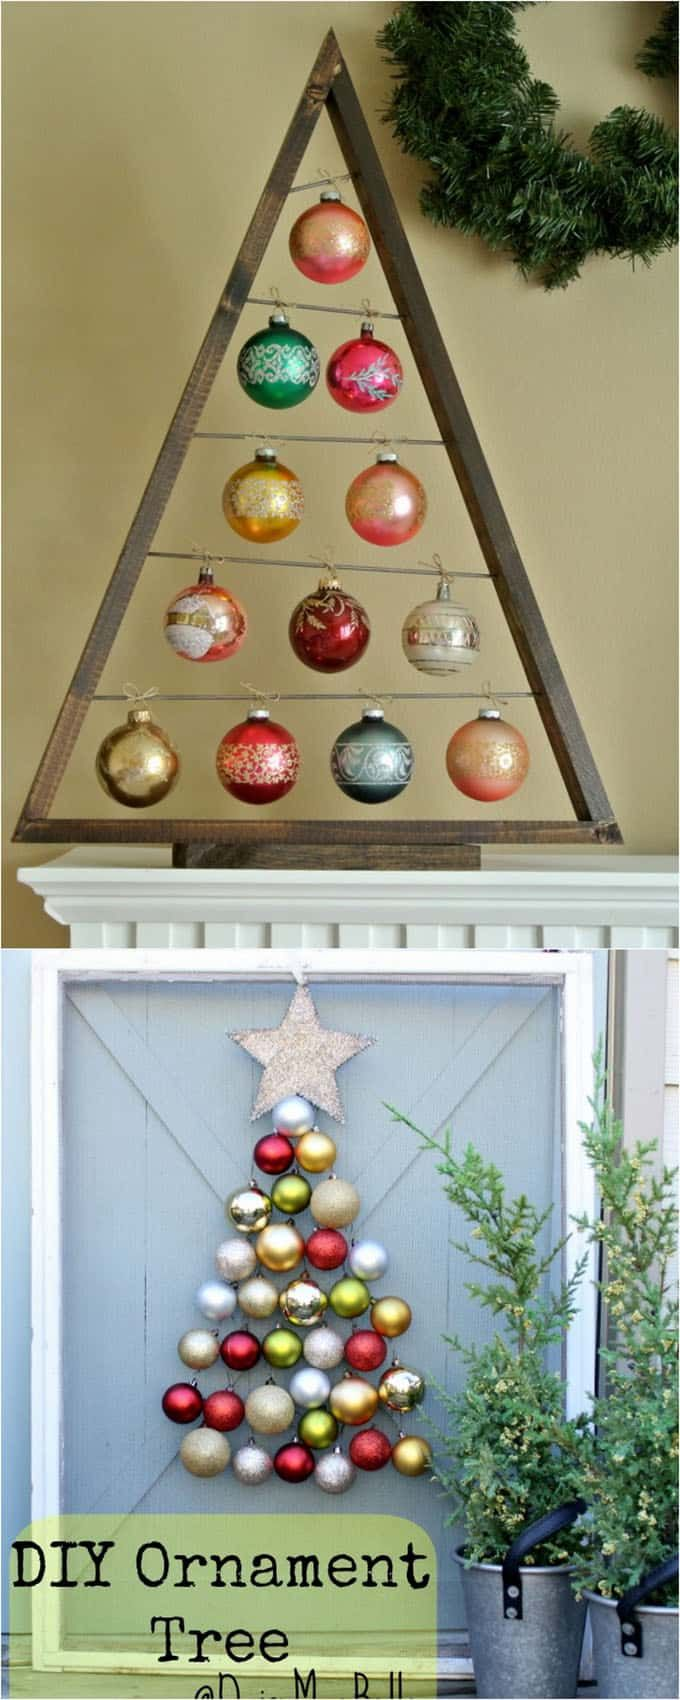 Best 25 Christmas material ideas on Pinterest  Cottage diy decor